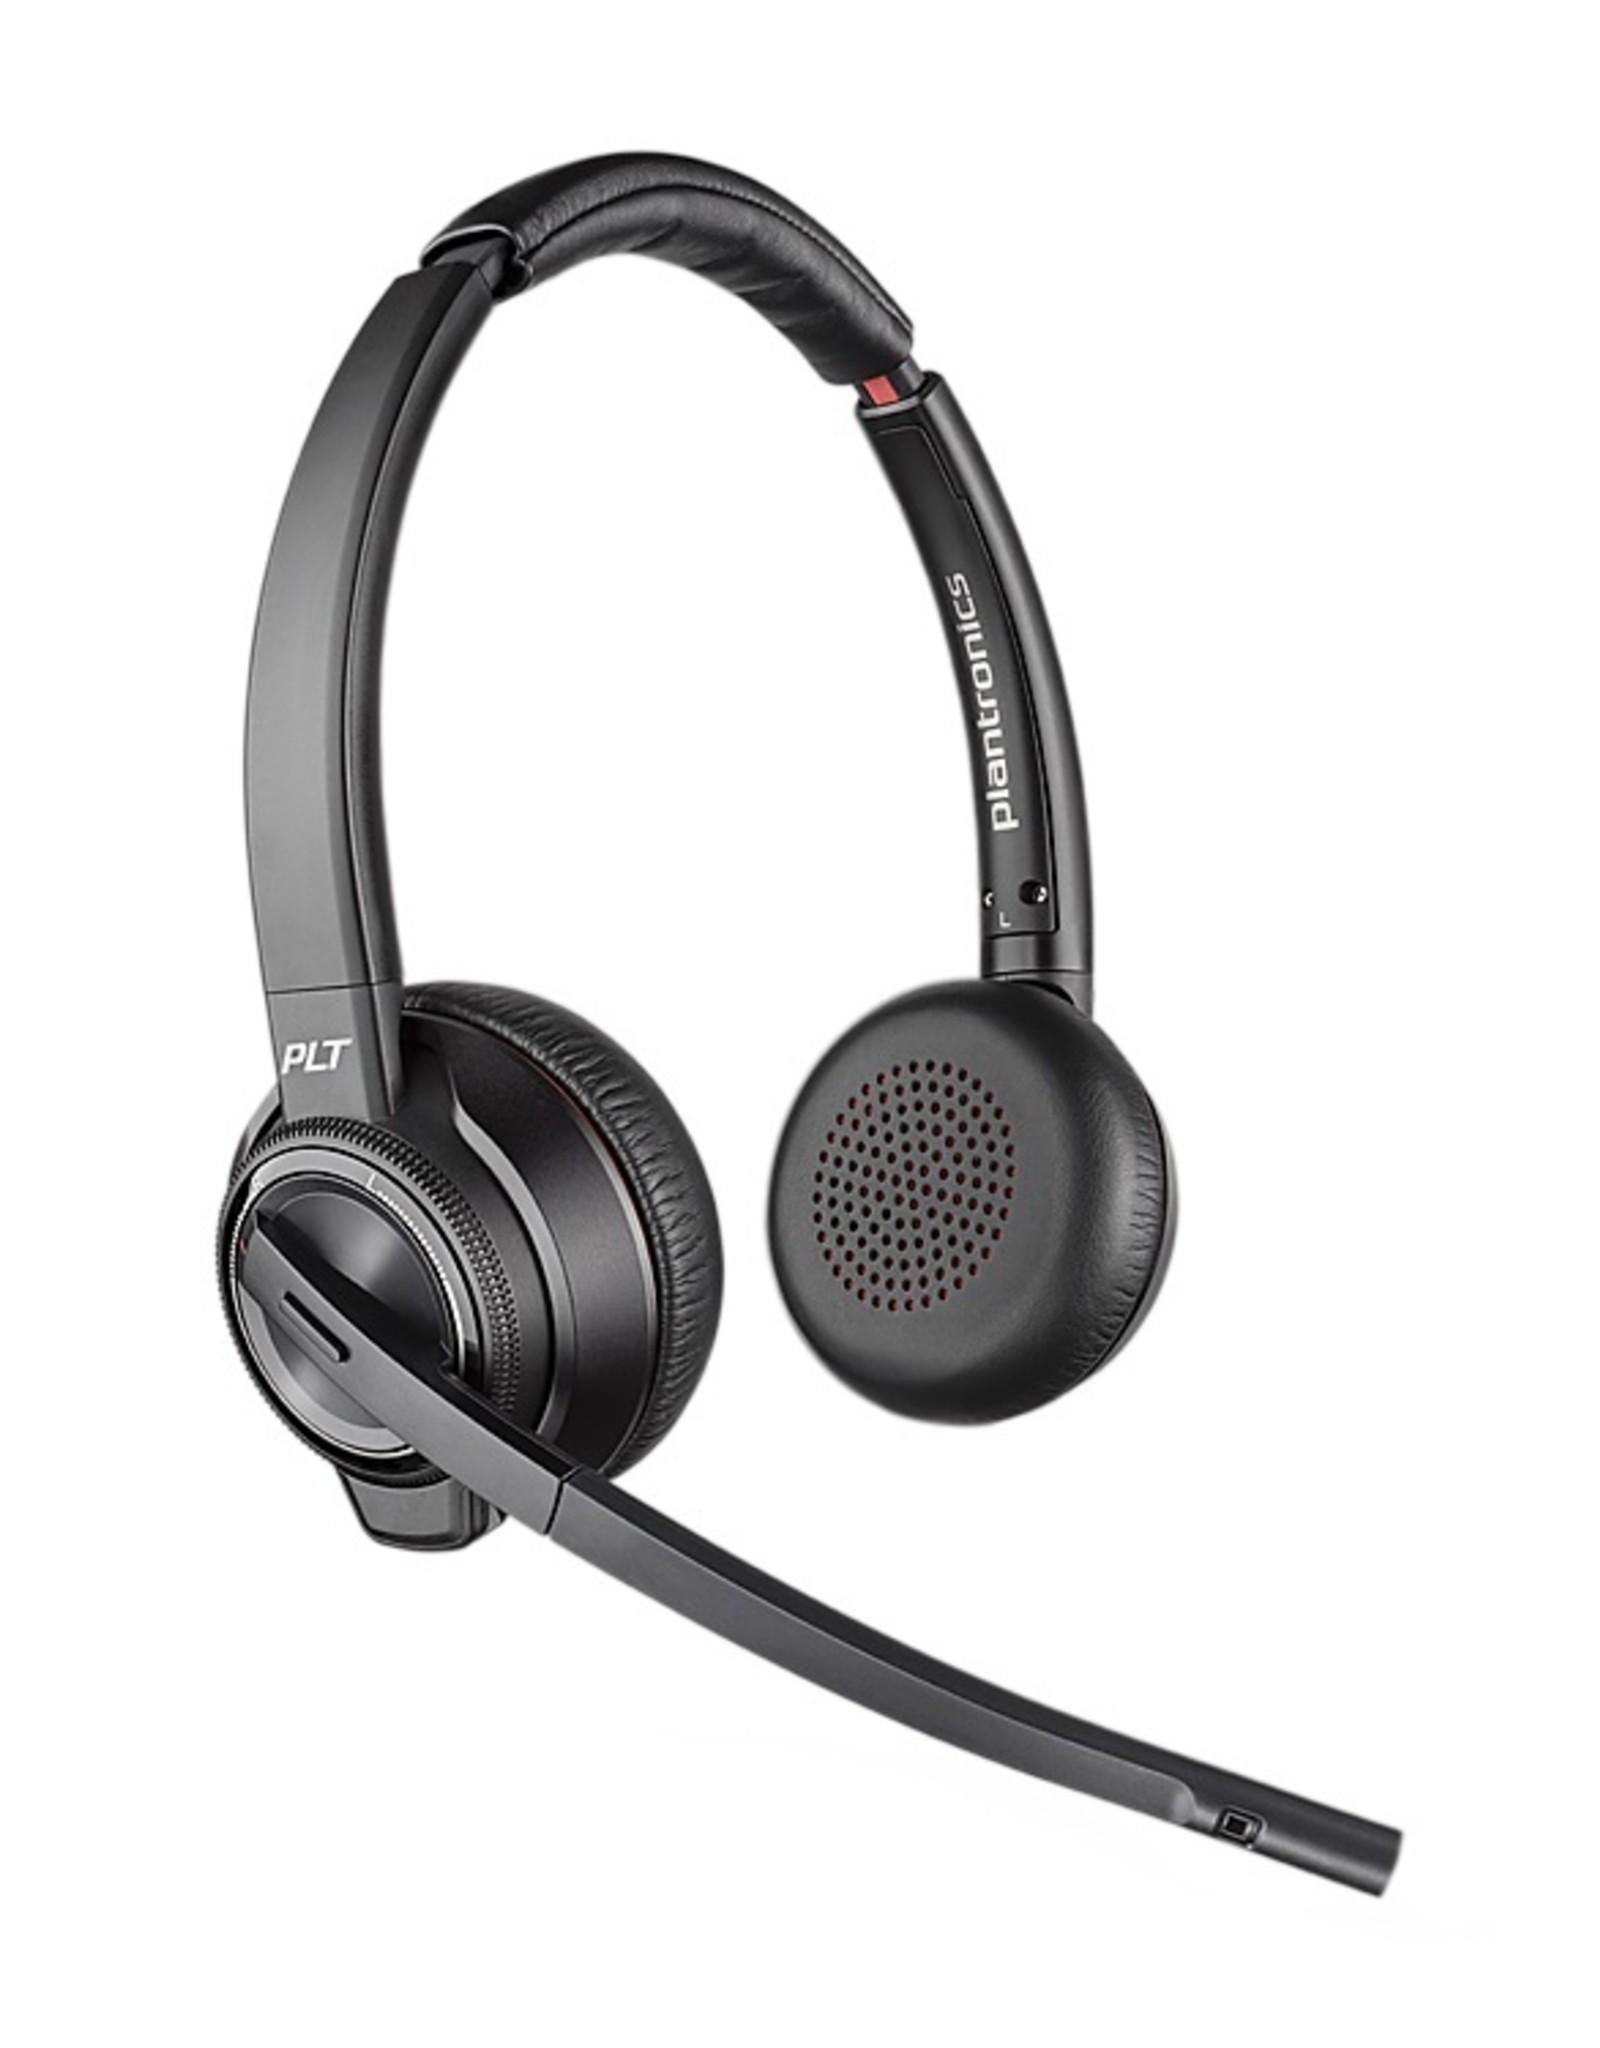 Plantronics Plantronics Savi 8210 - Dect - Mono Headset - Active Noise Cancelling